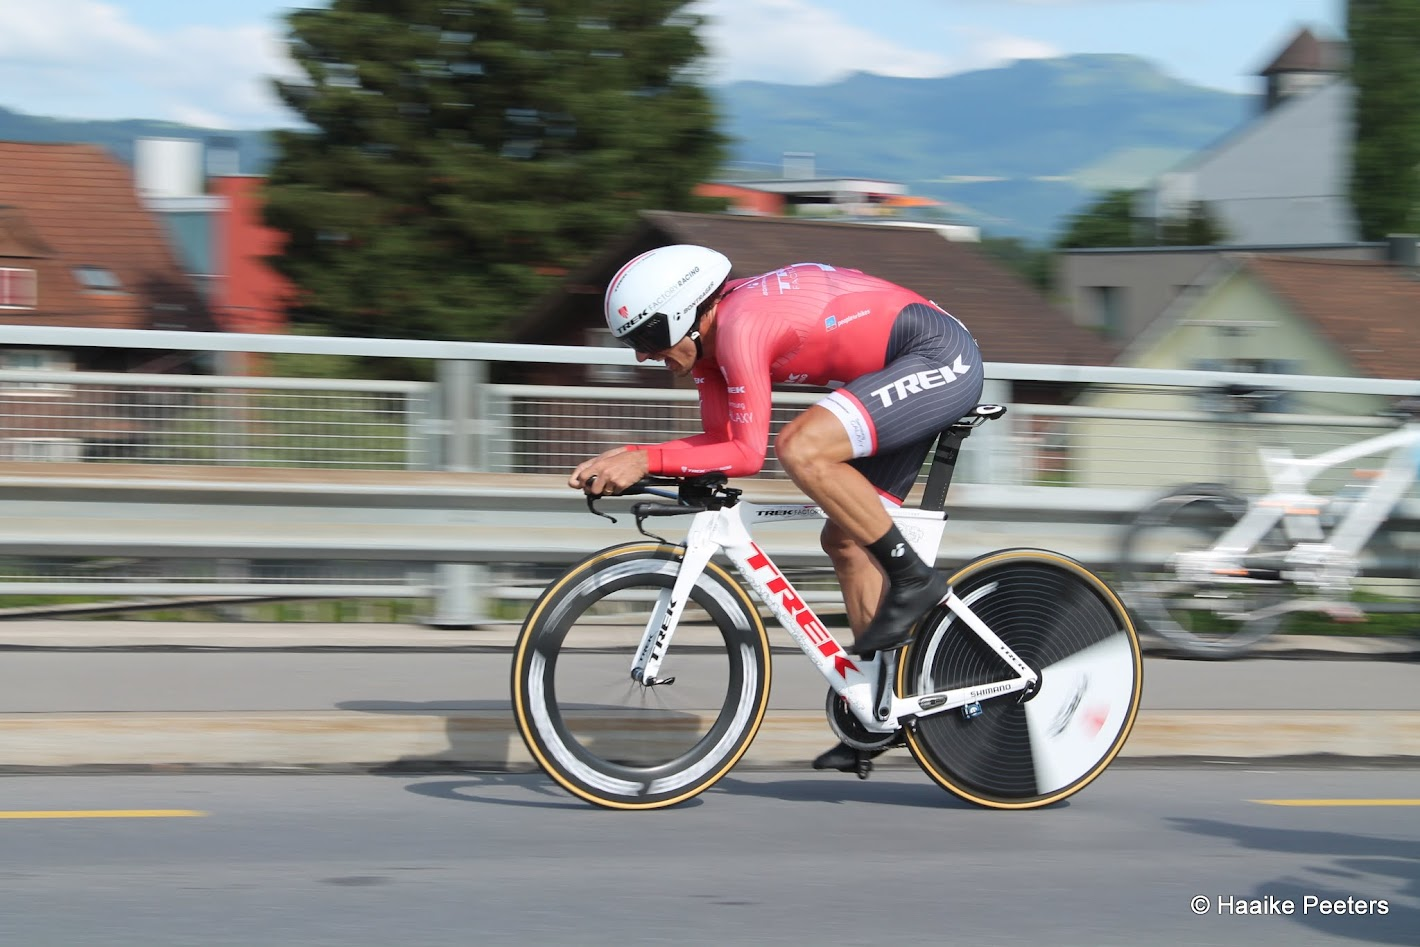 Cancellara @ Tour de Suisse (Le petit requin)